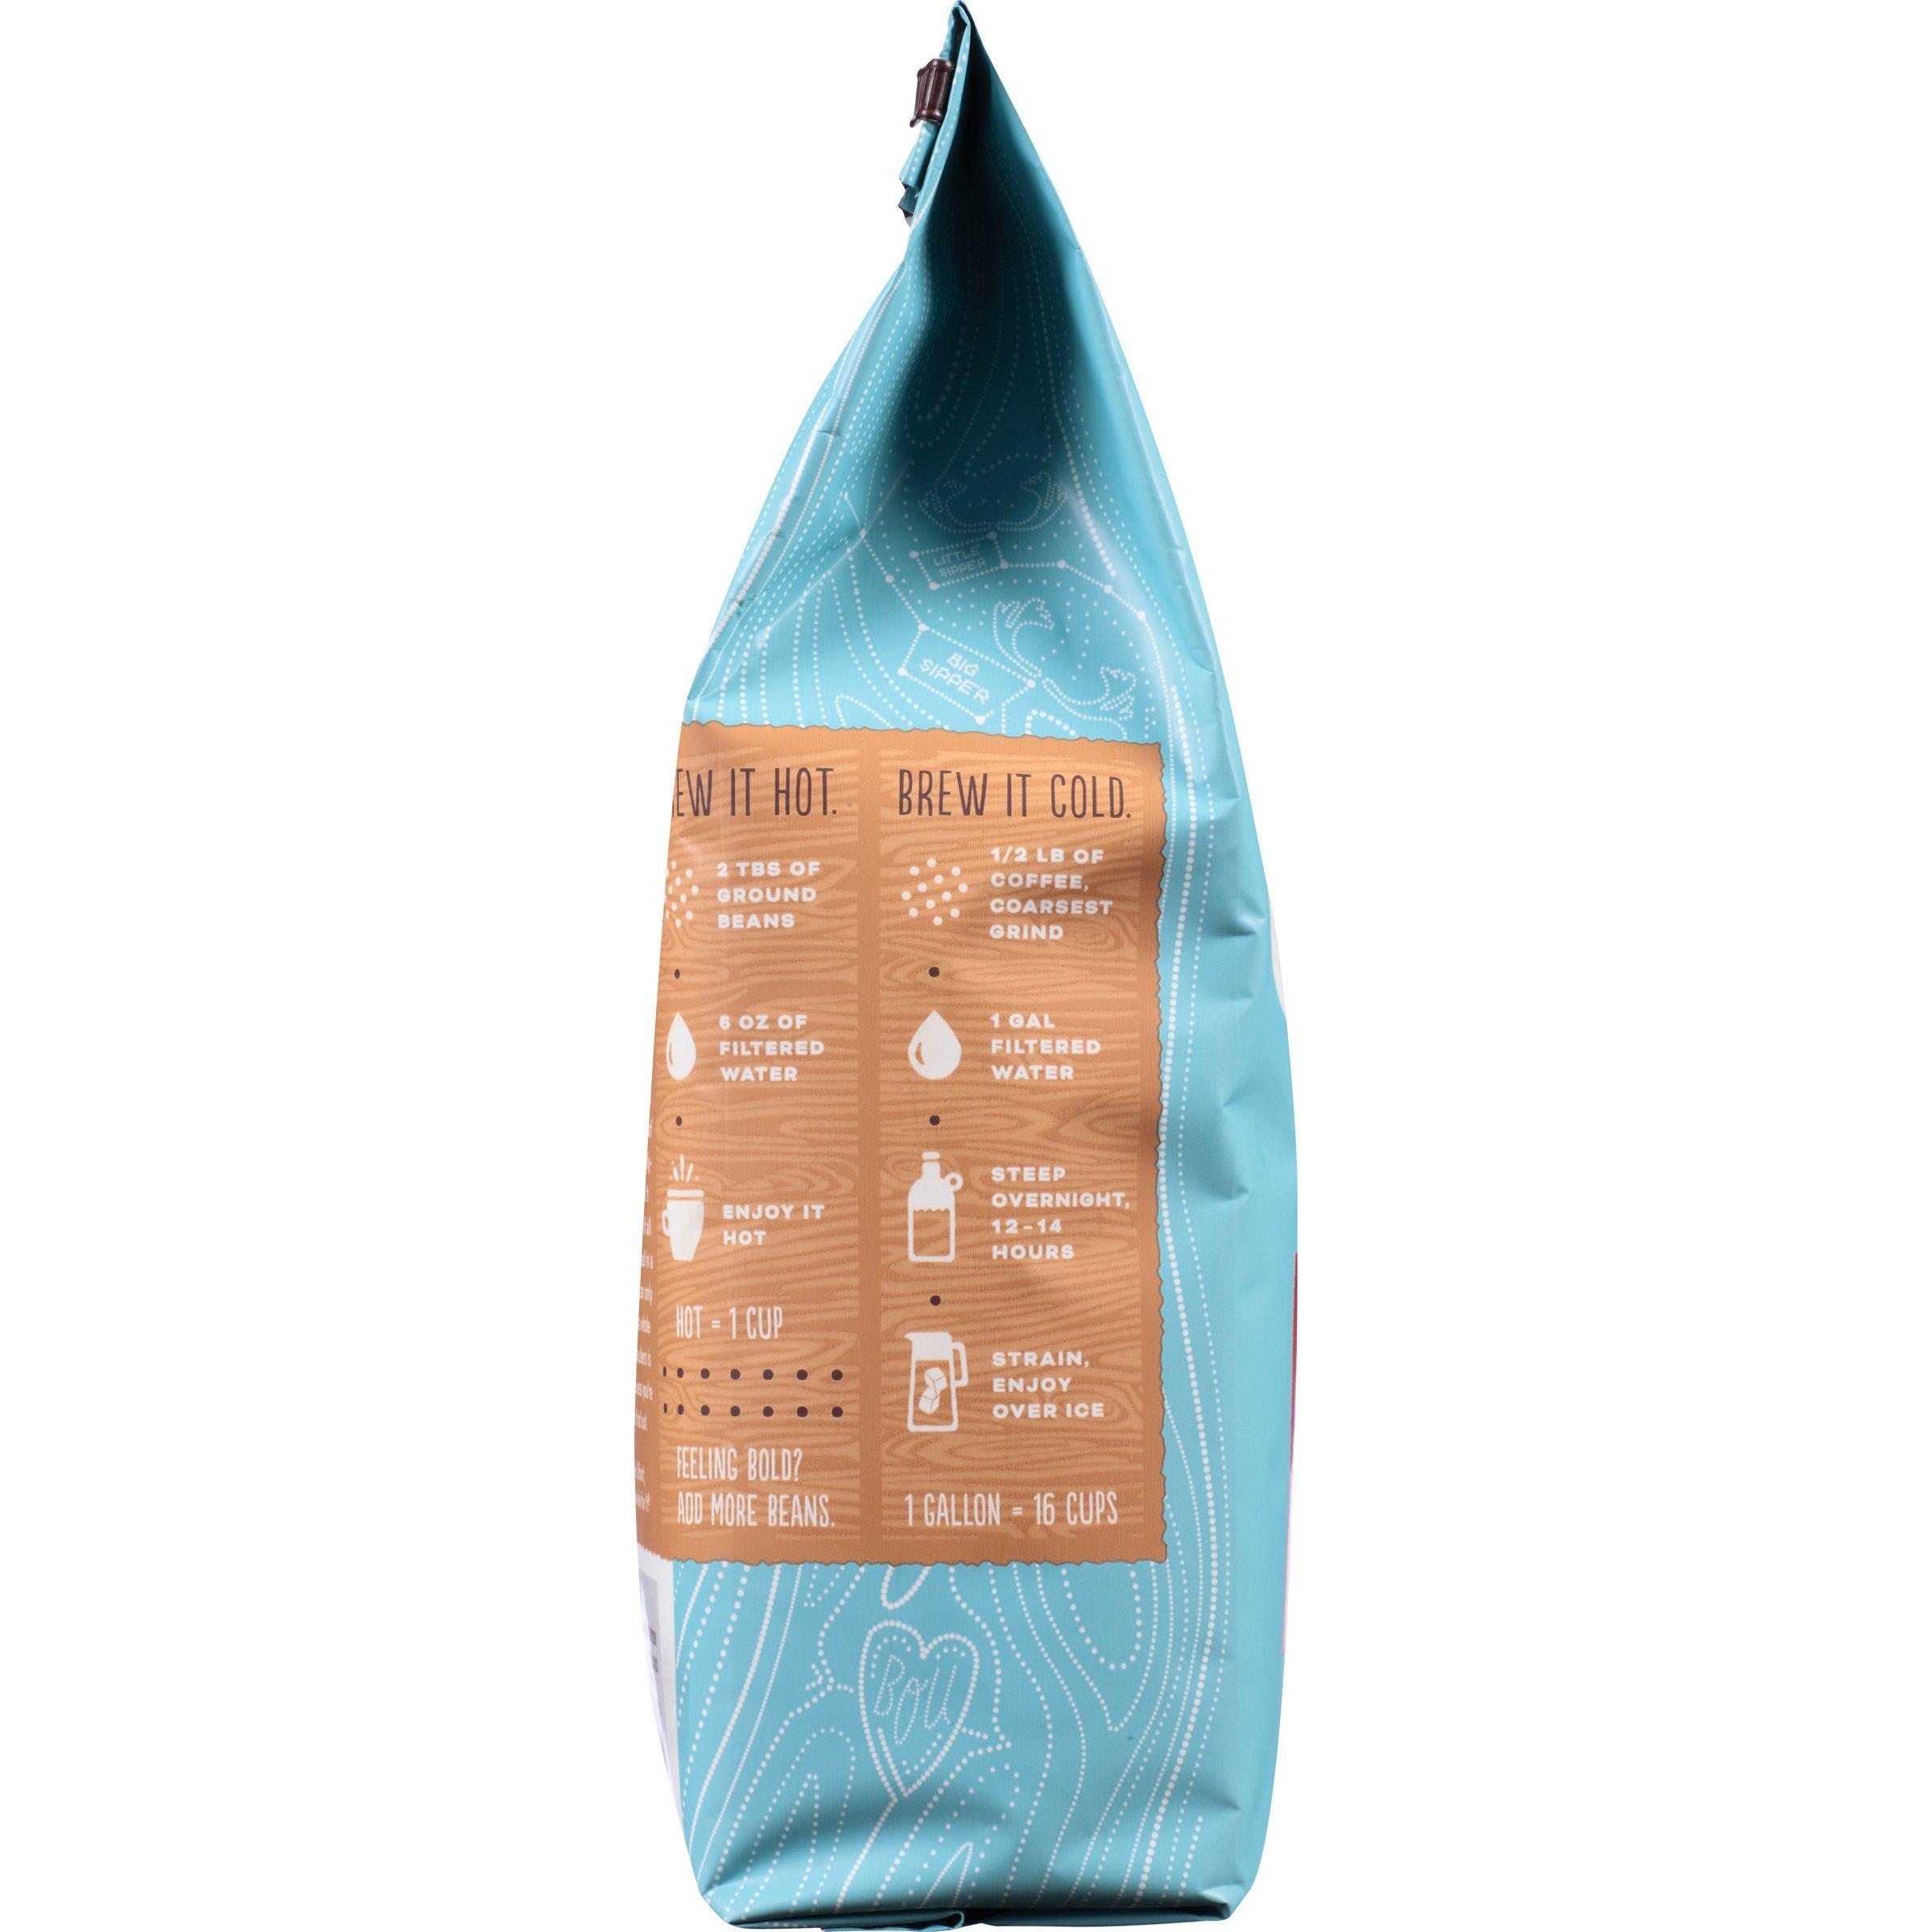 Caribou Coffee, Mahogany Dark Roast, 20 oz. Bag, Dark Roast Blend of El Salvador, Sumatra, & Guatemala Coffee Beans, Earthy, Dark, & Bold, with A Raw Sugar Finish, Arabica Coffee; Sustainable Sourcing by Caribou Coffee (Image #4)